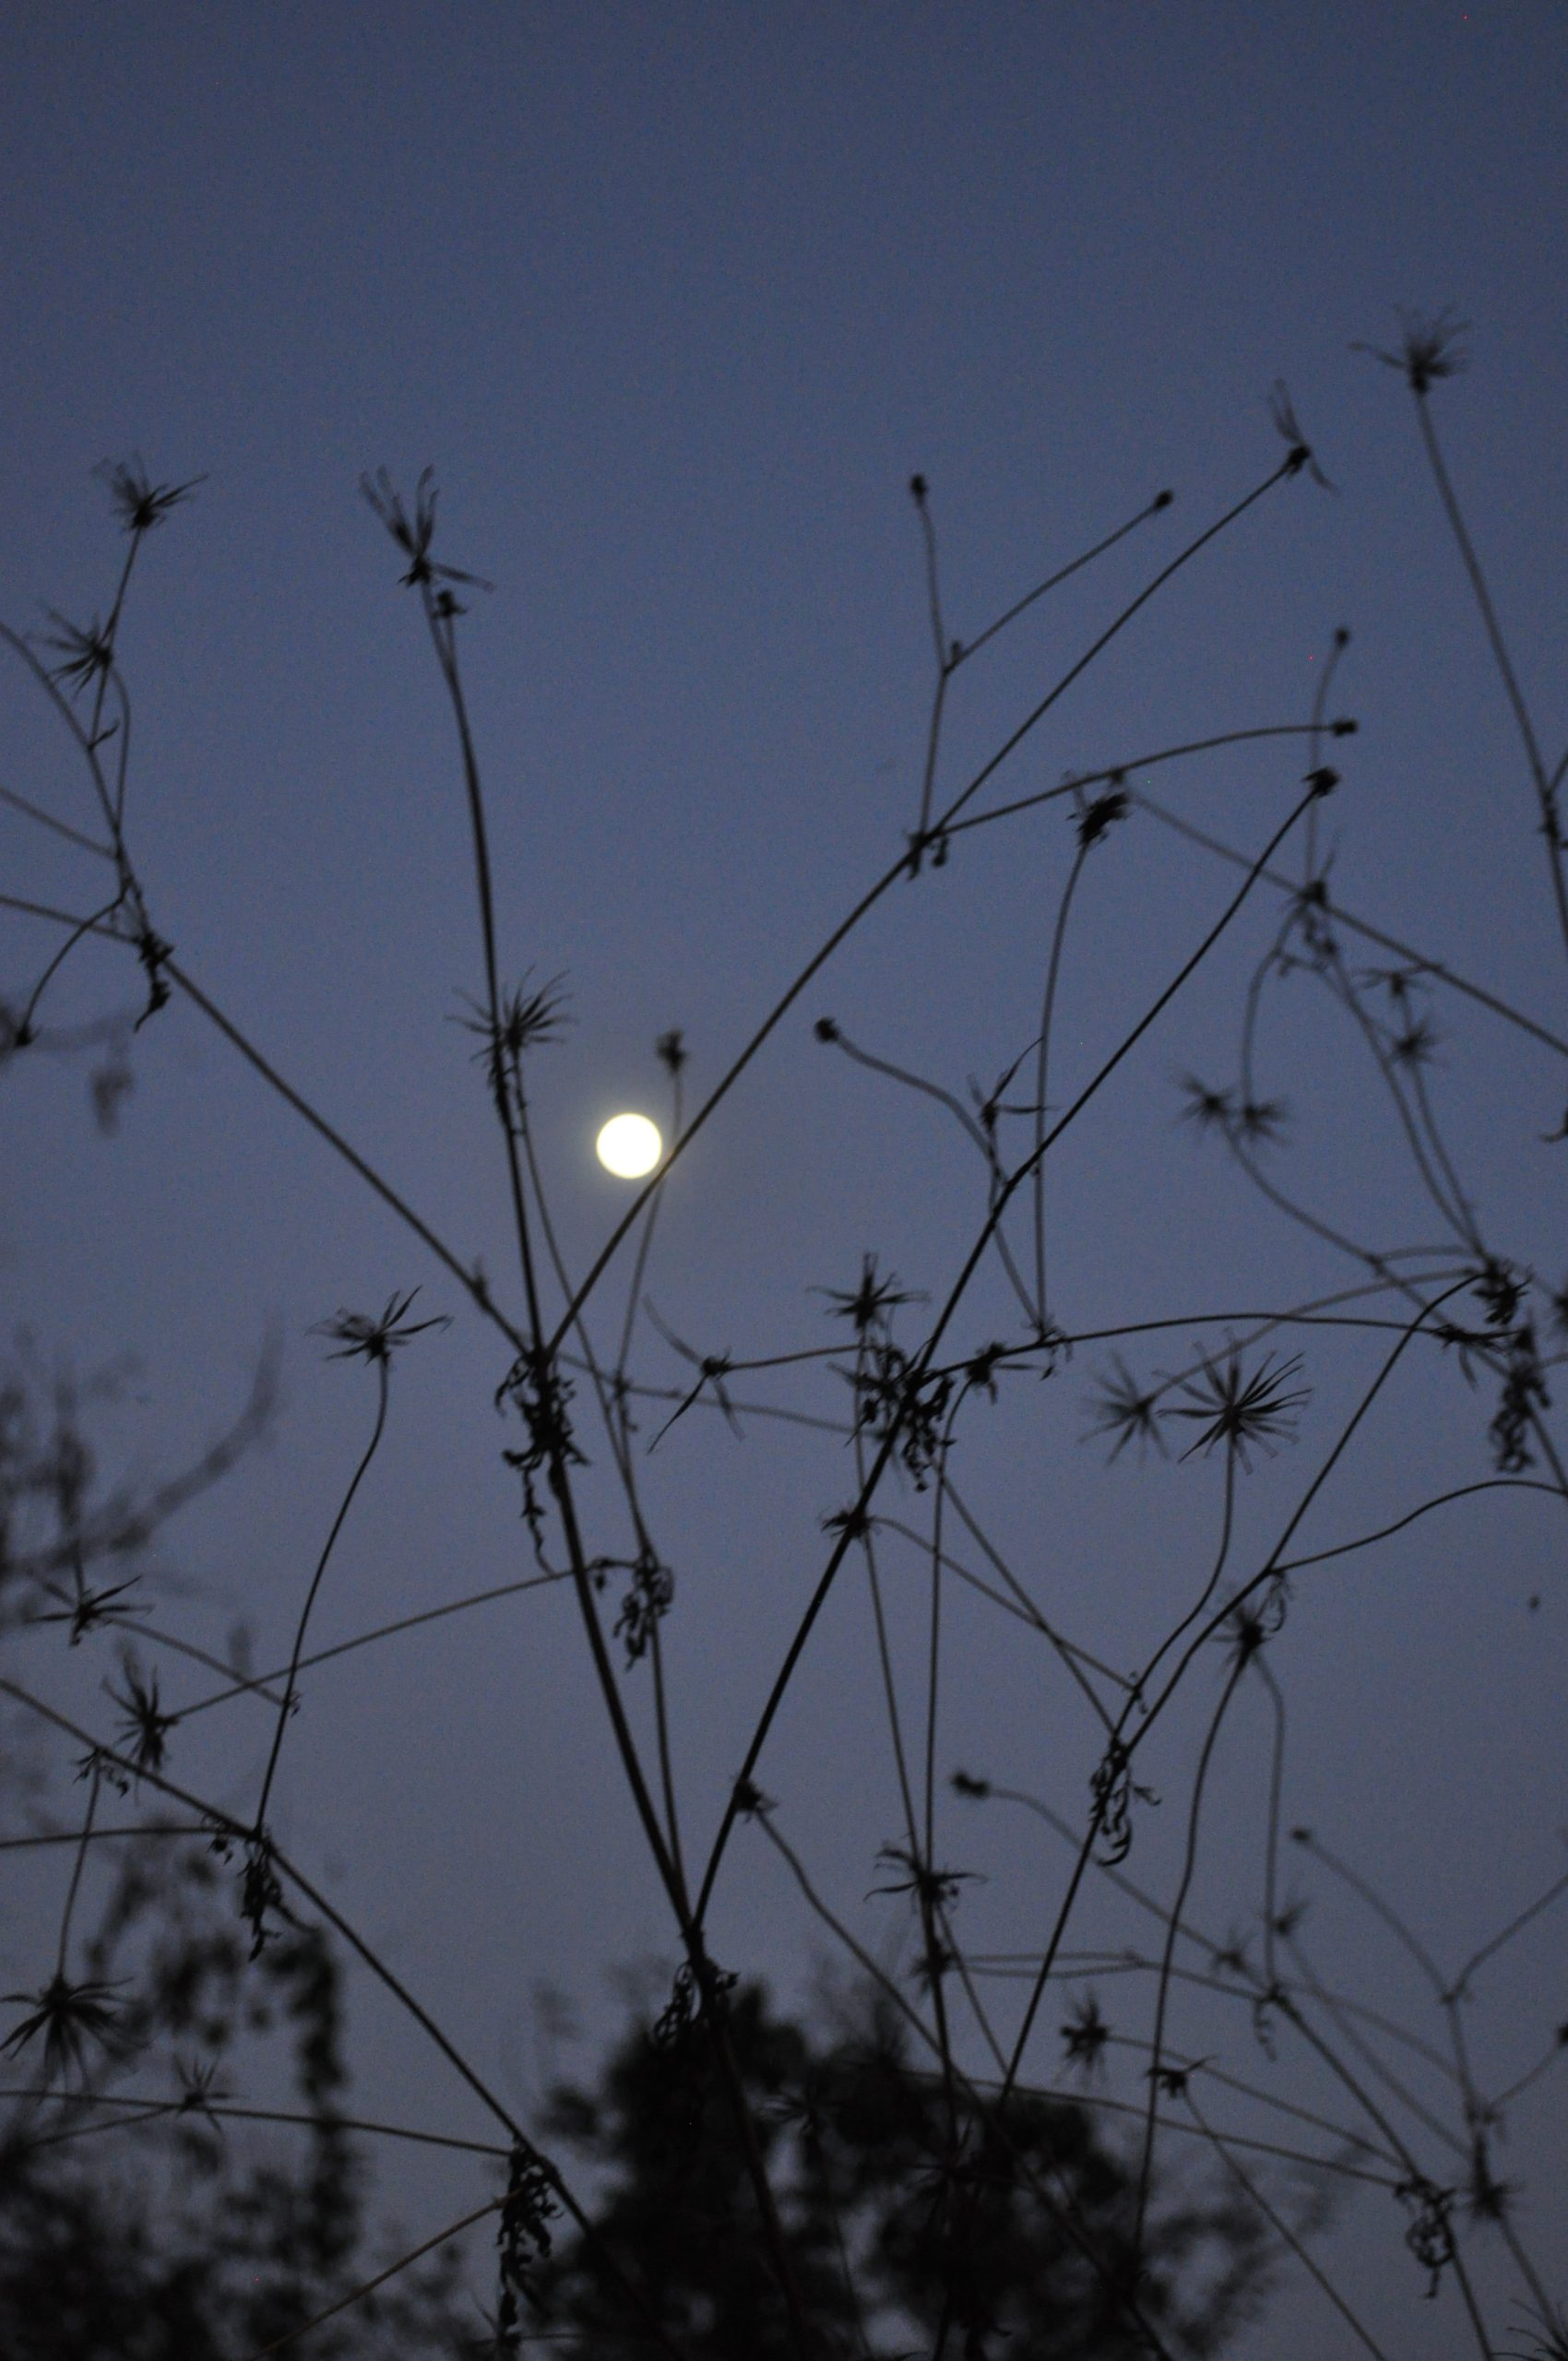 Moon through plants